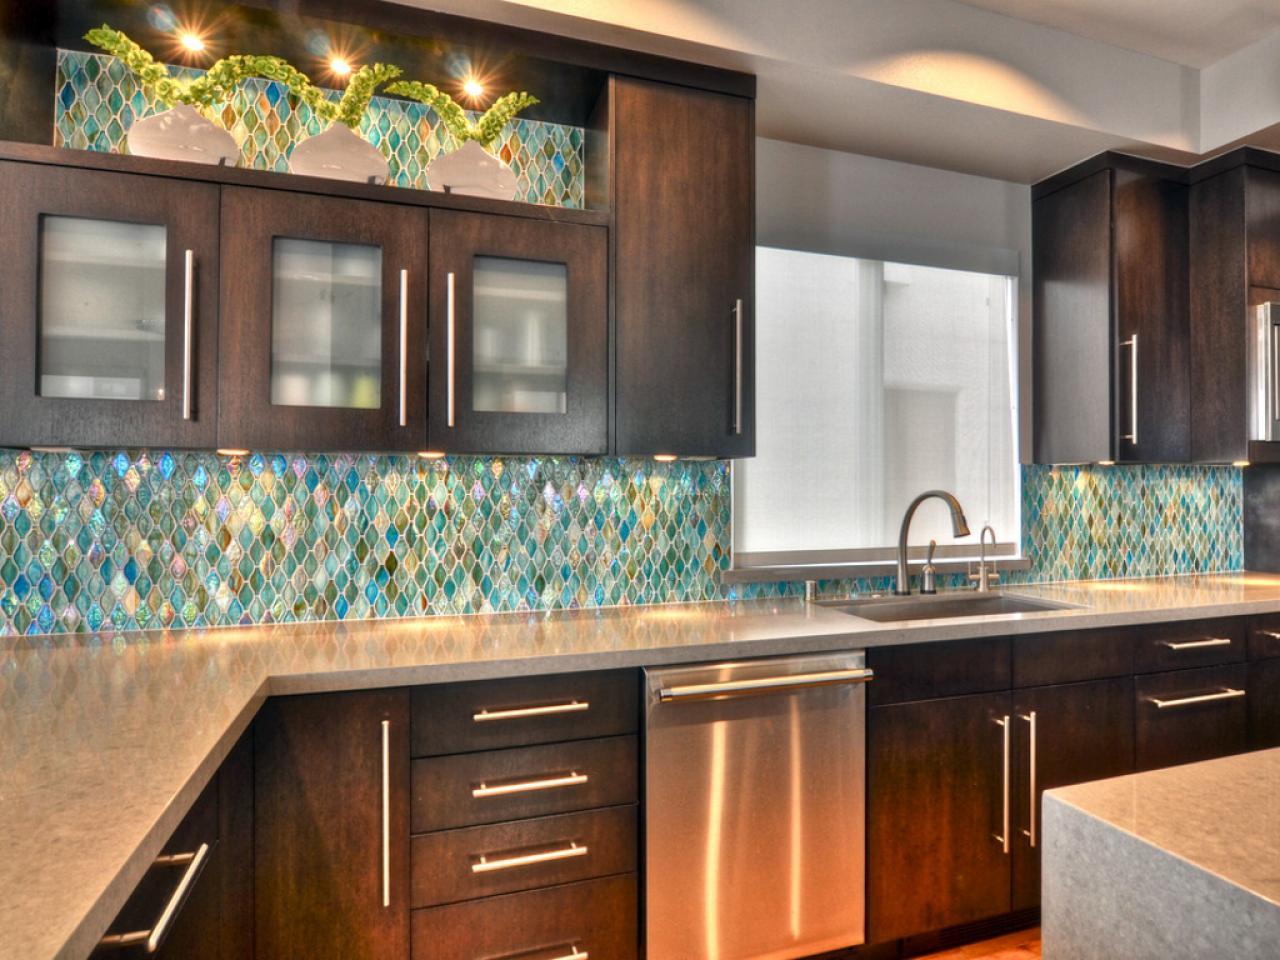 køkken-backsplash-glass_4x3-jpg-rend-hgtvcom-1280-960